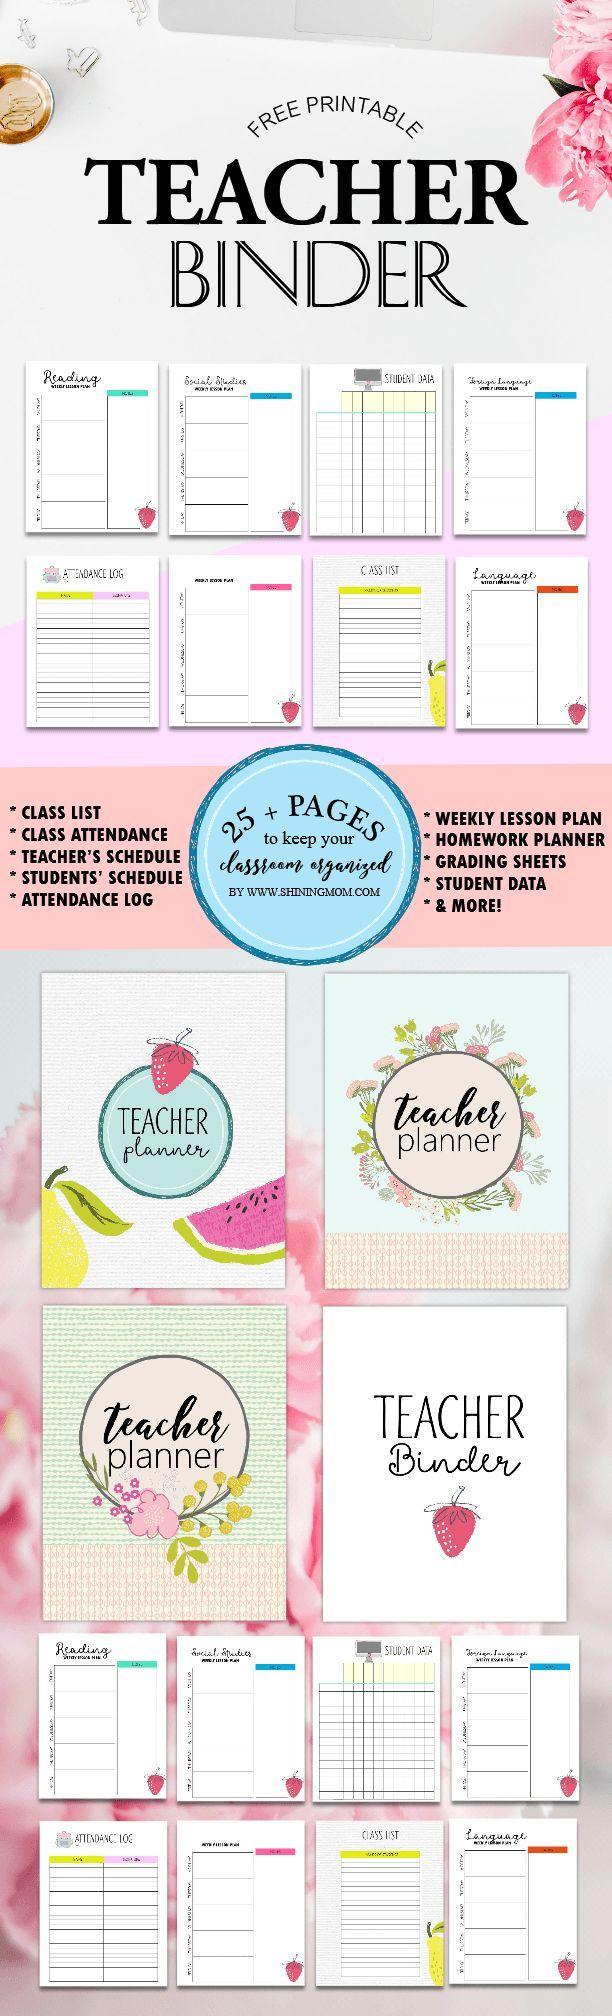 Best Lesson Plan Templates Ideas On Pinterest Teacher Lesson - Free lesson plan template